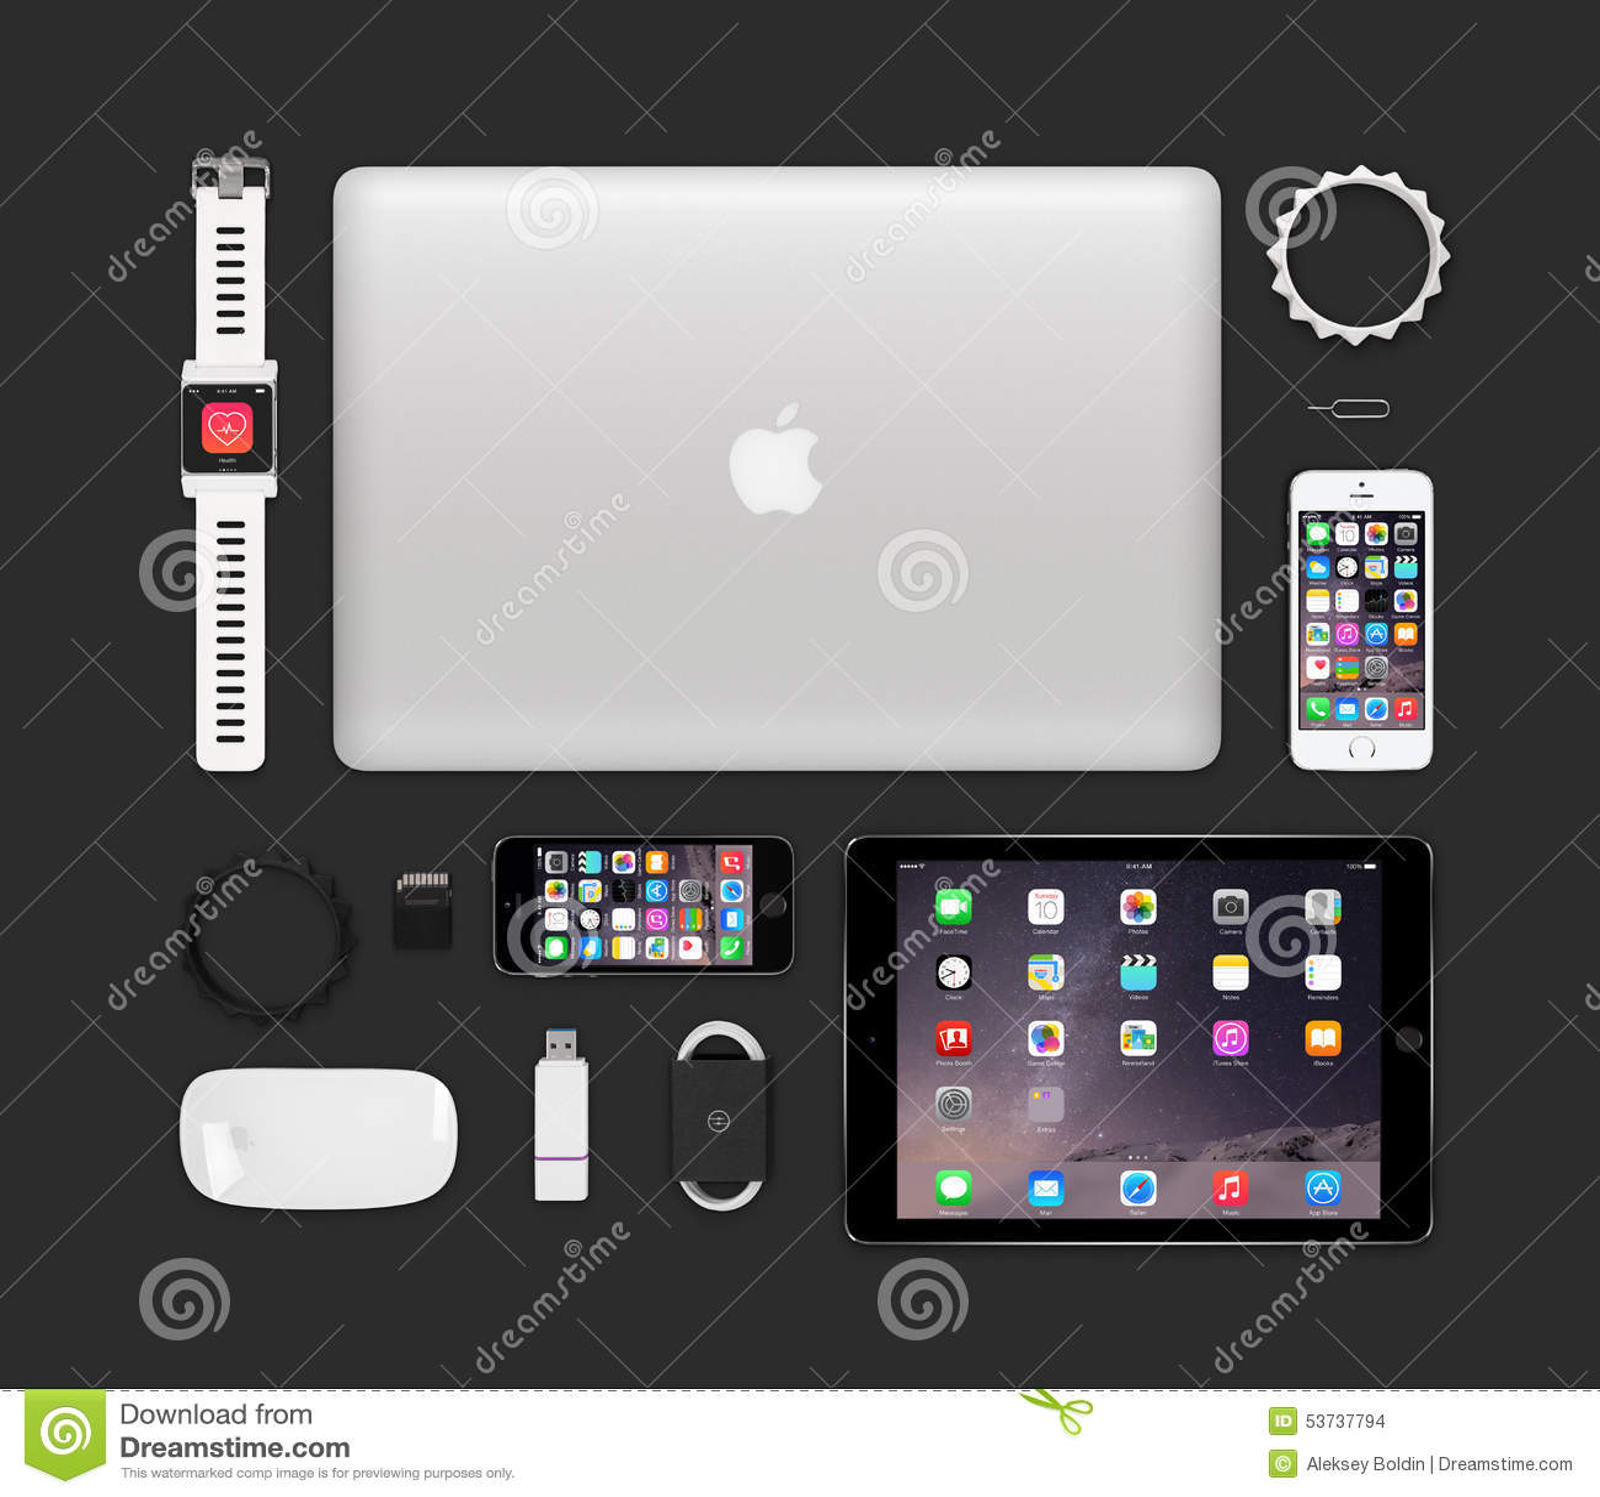 macbook background